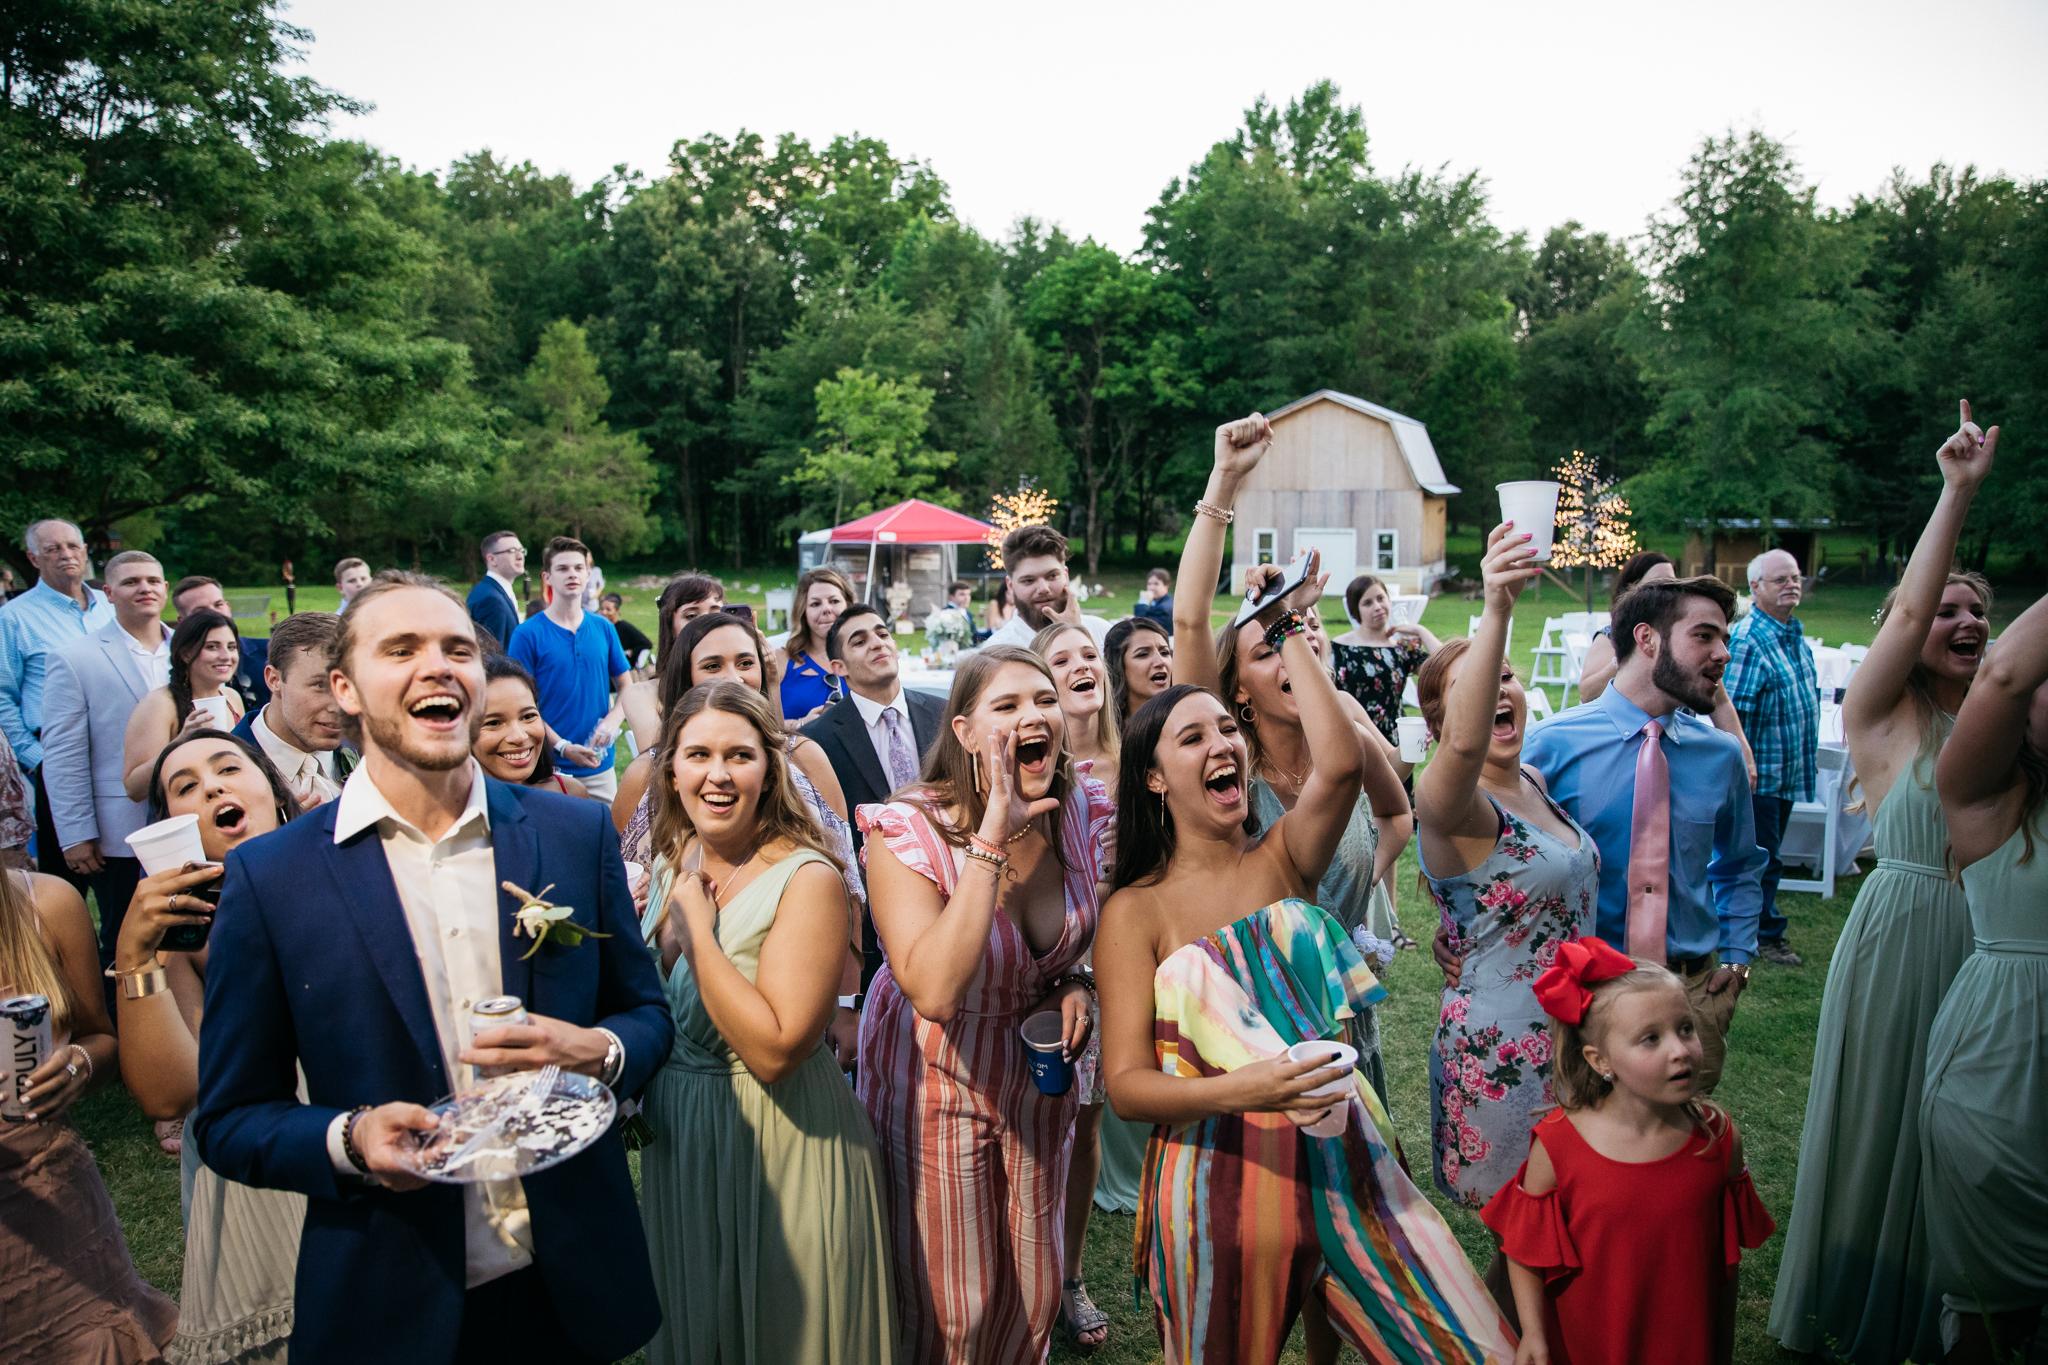 backyard-wedding-thewarmtharoundyou-lexy-branson-81.jpg